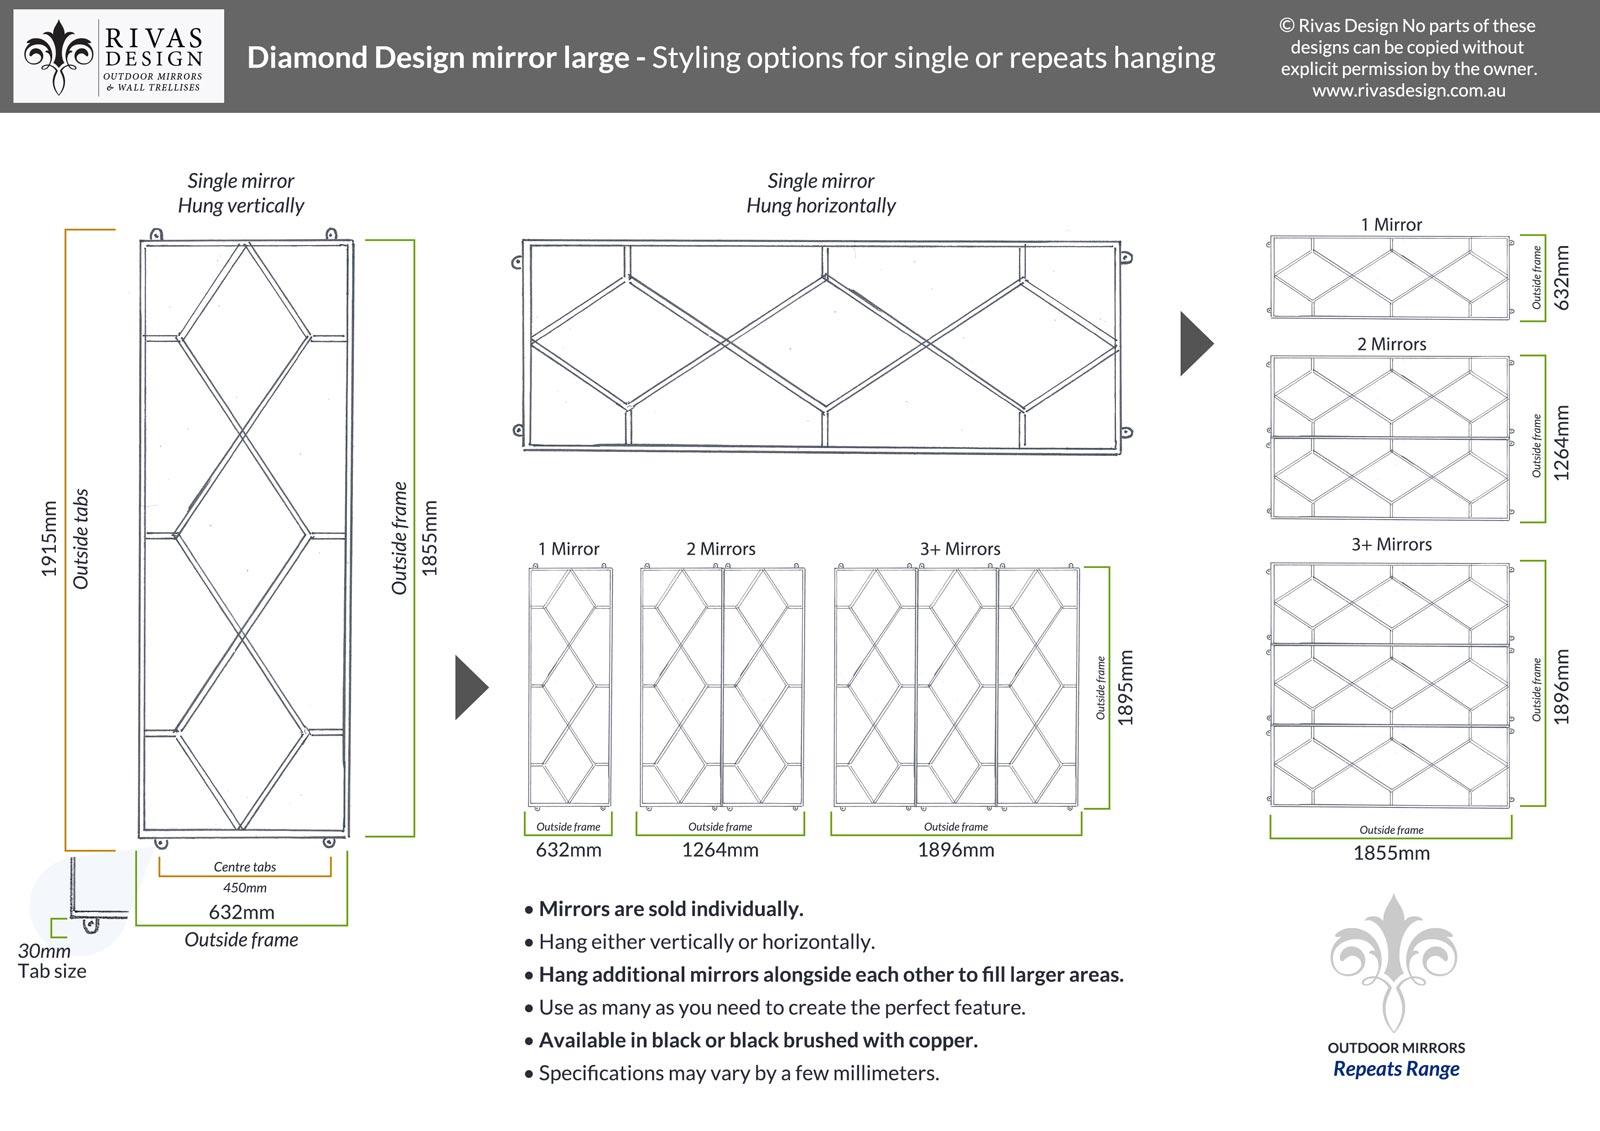 Diamond Design outdoor mirror large